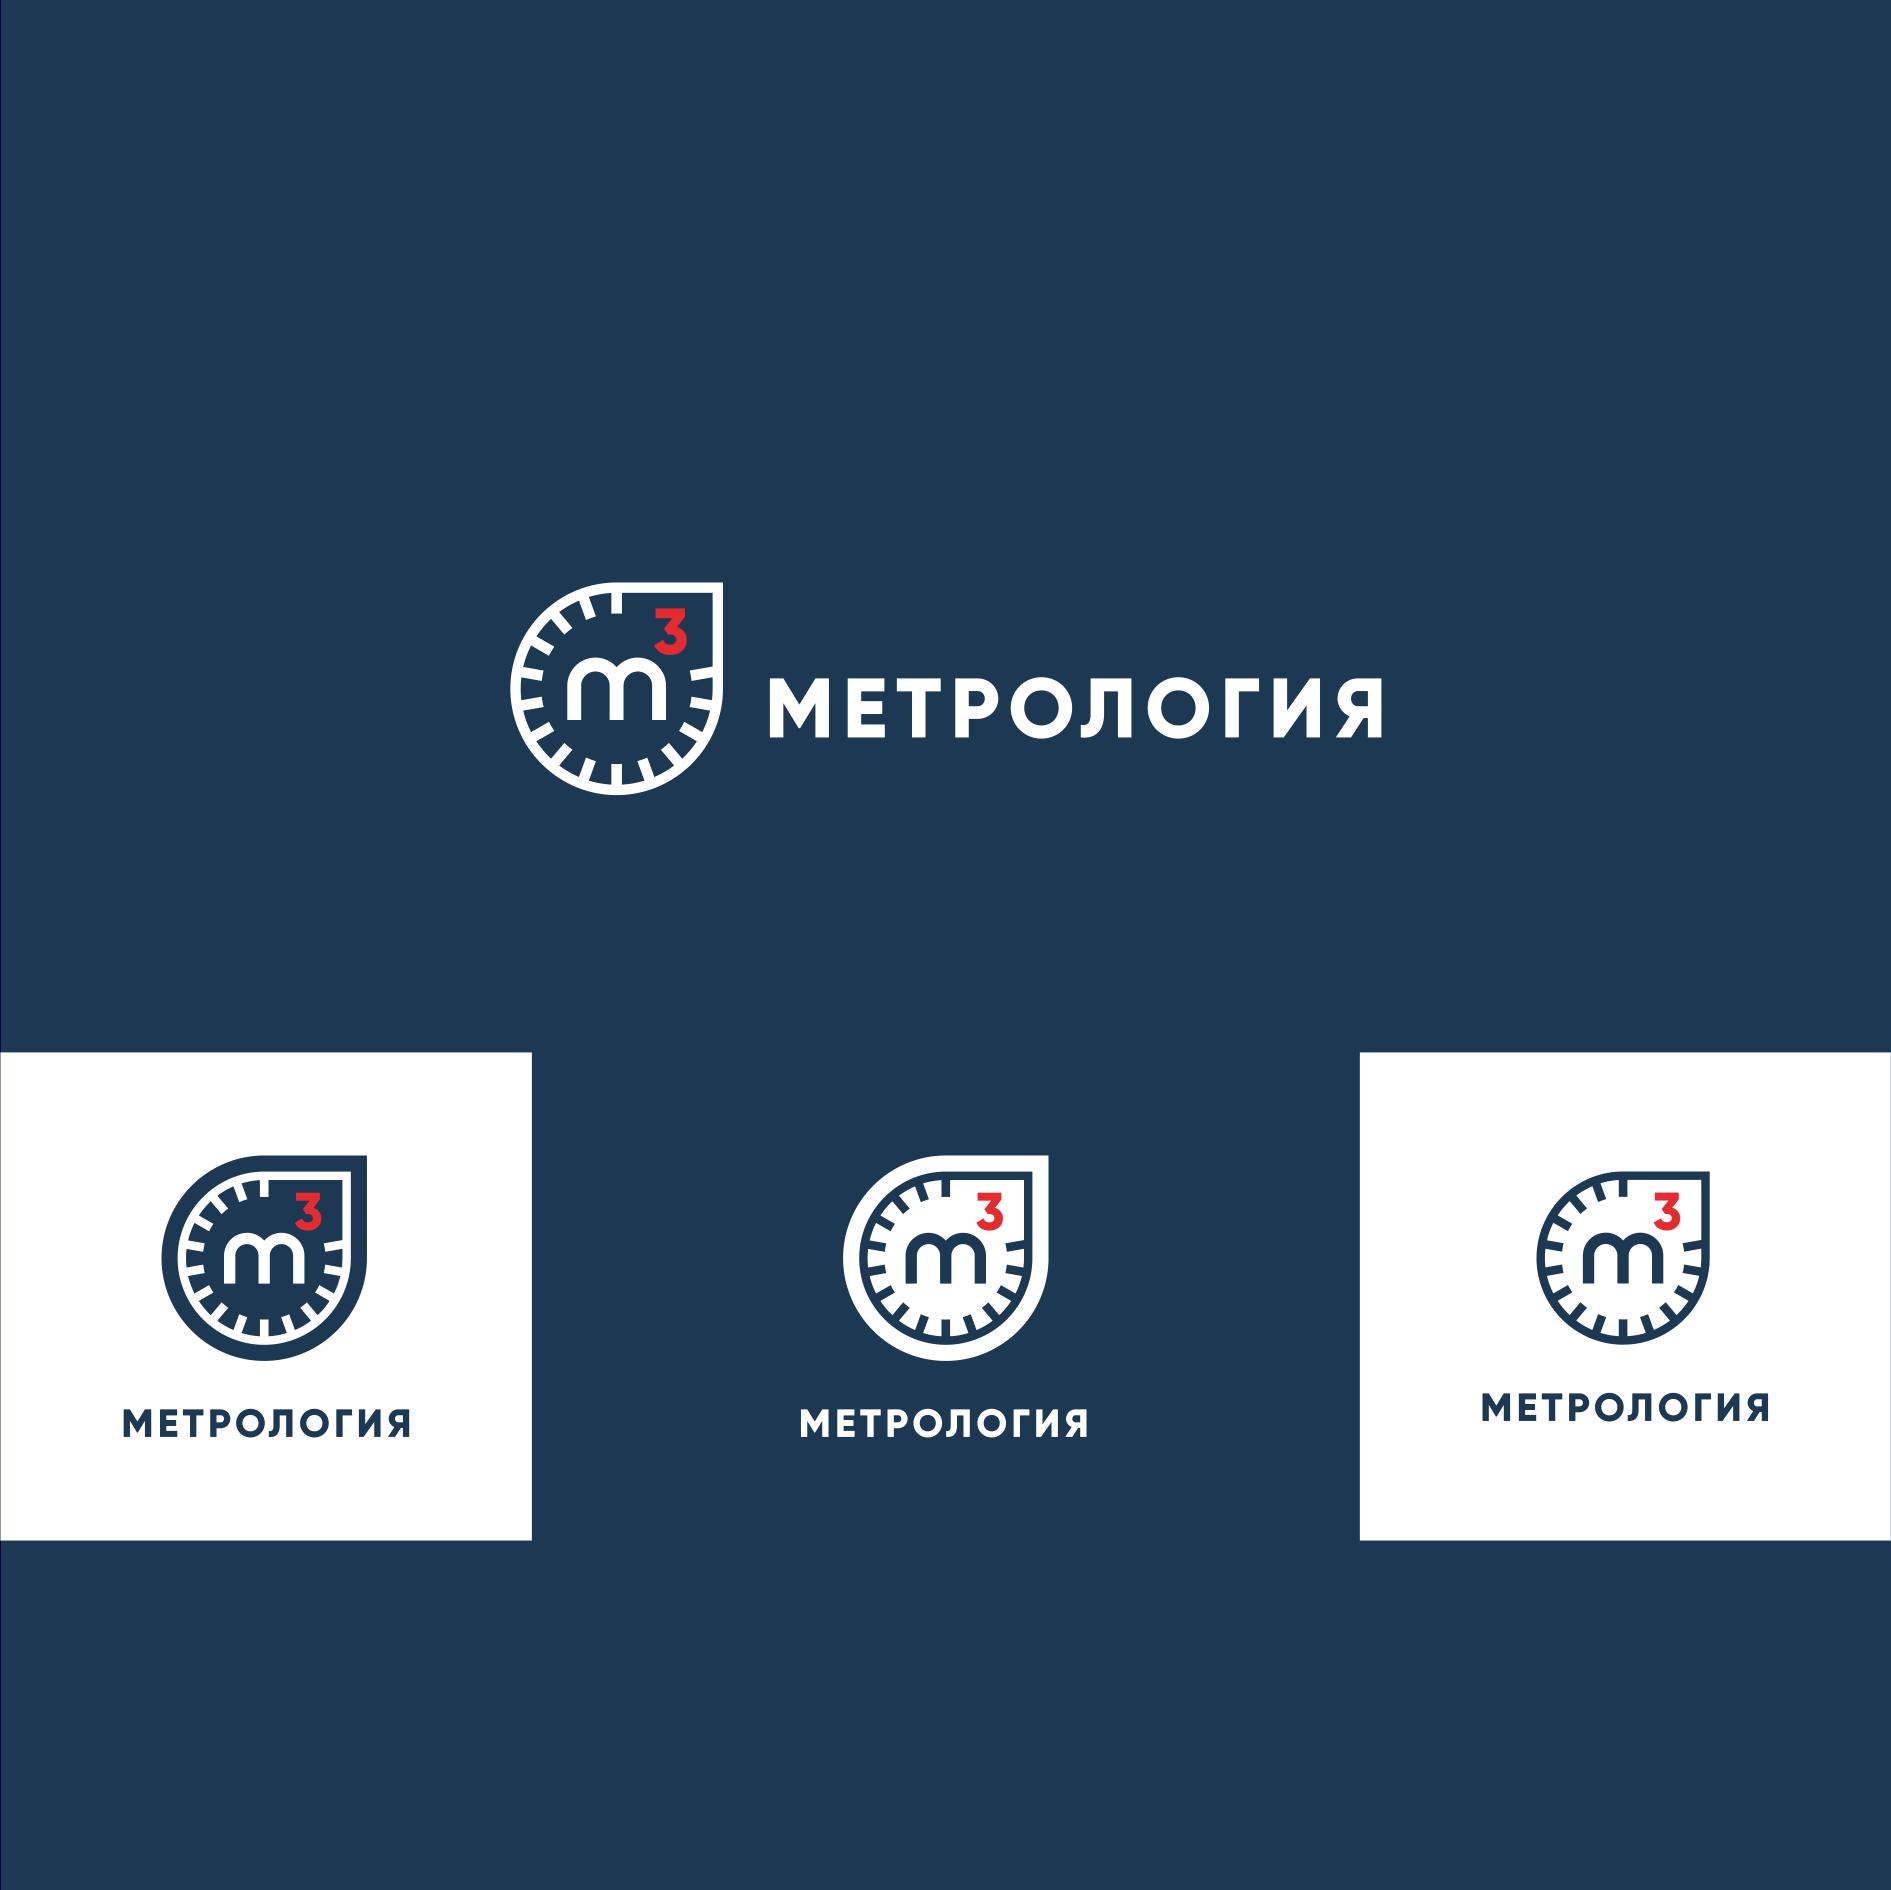 Разработать логотип, визитку, фирменный бланк. фото f_30458f8705ea4d9b.png